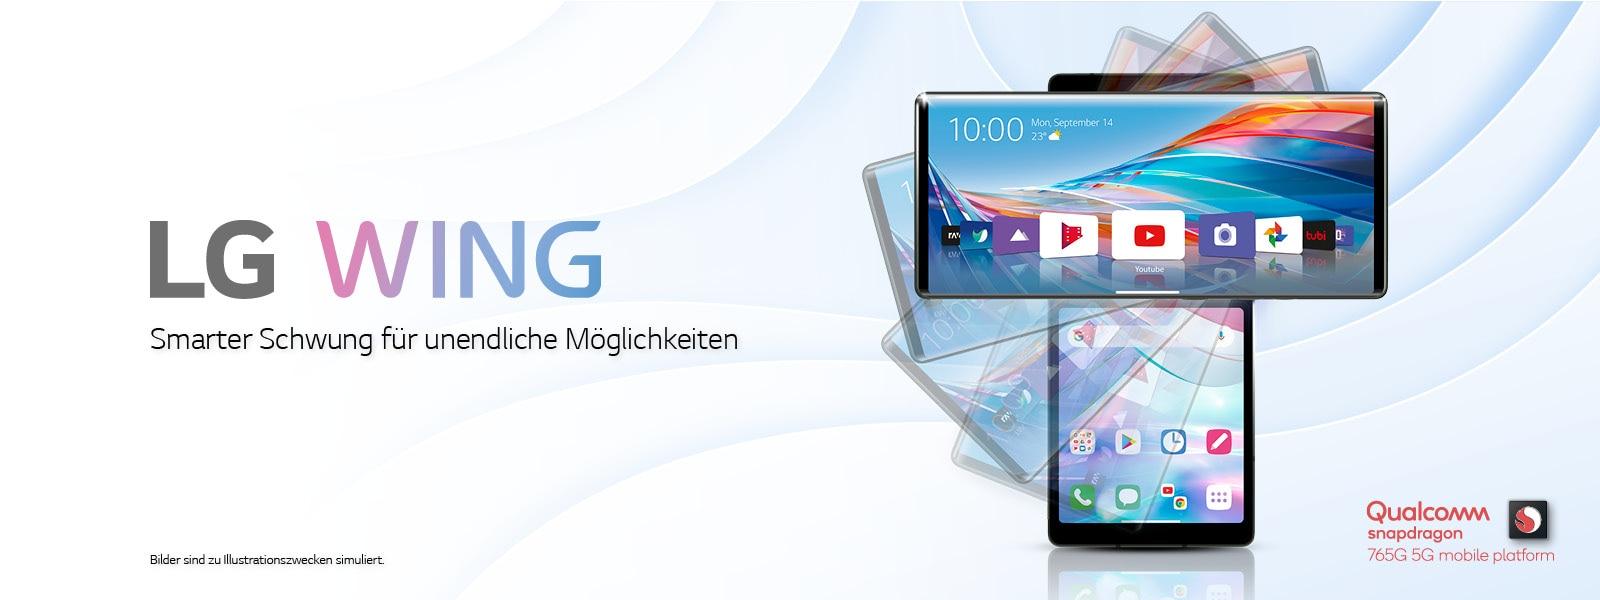 LG_WING_KeyVisual_Markenzeichen_Webformate_1600x600.jpg